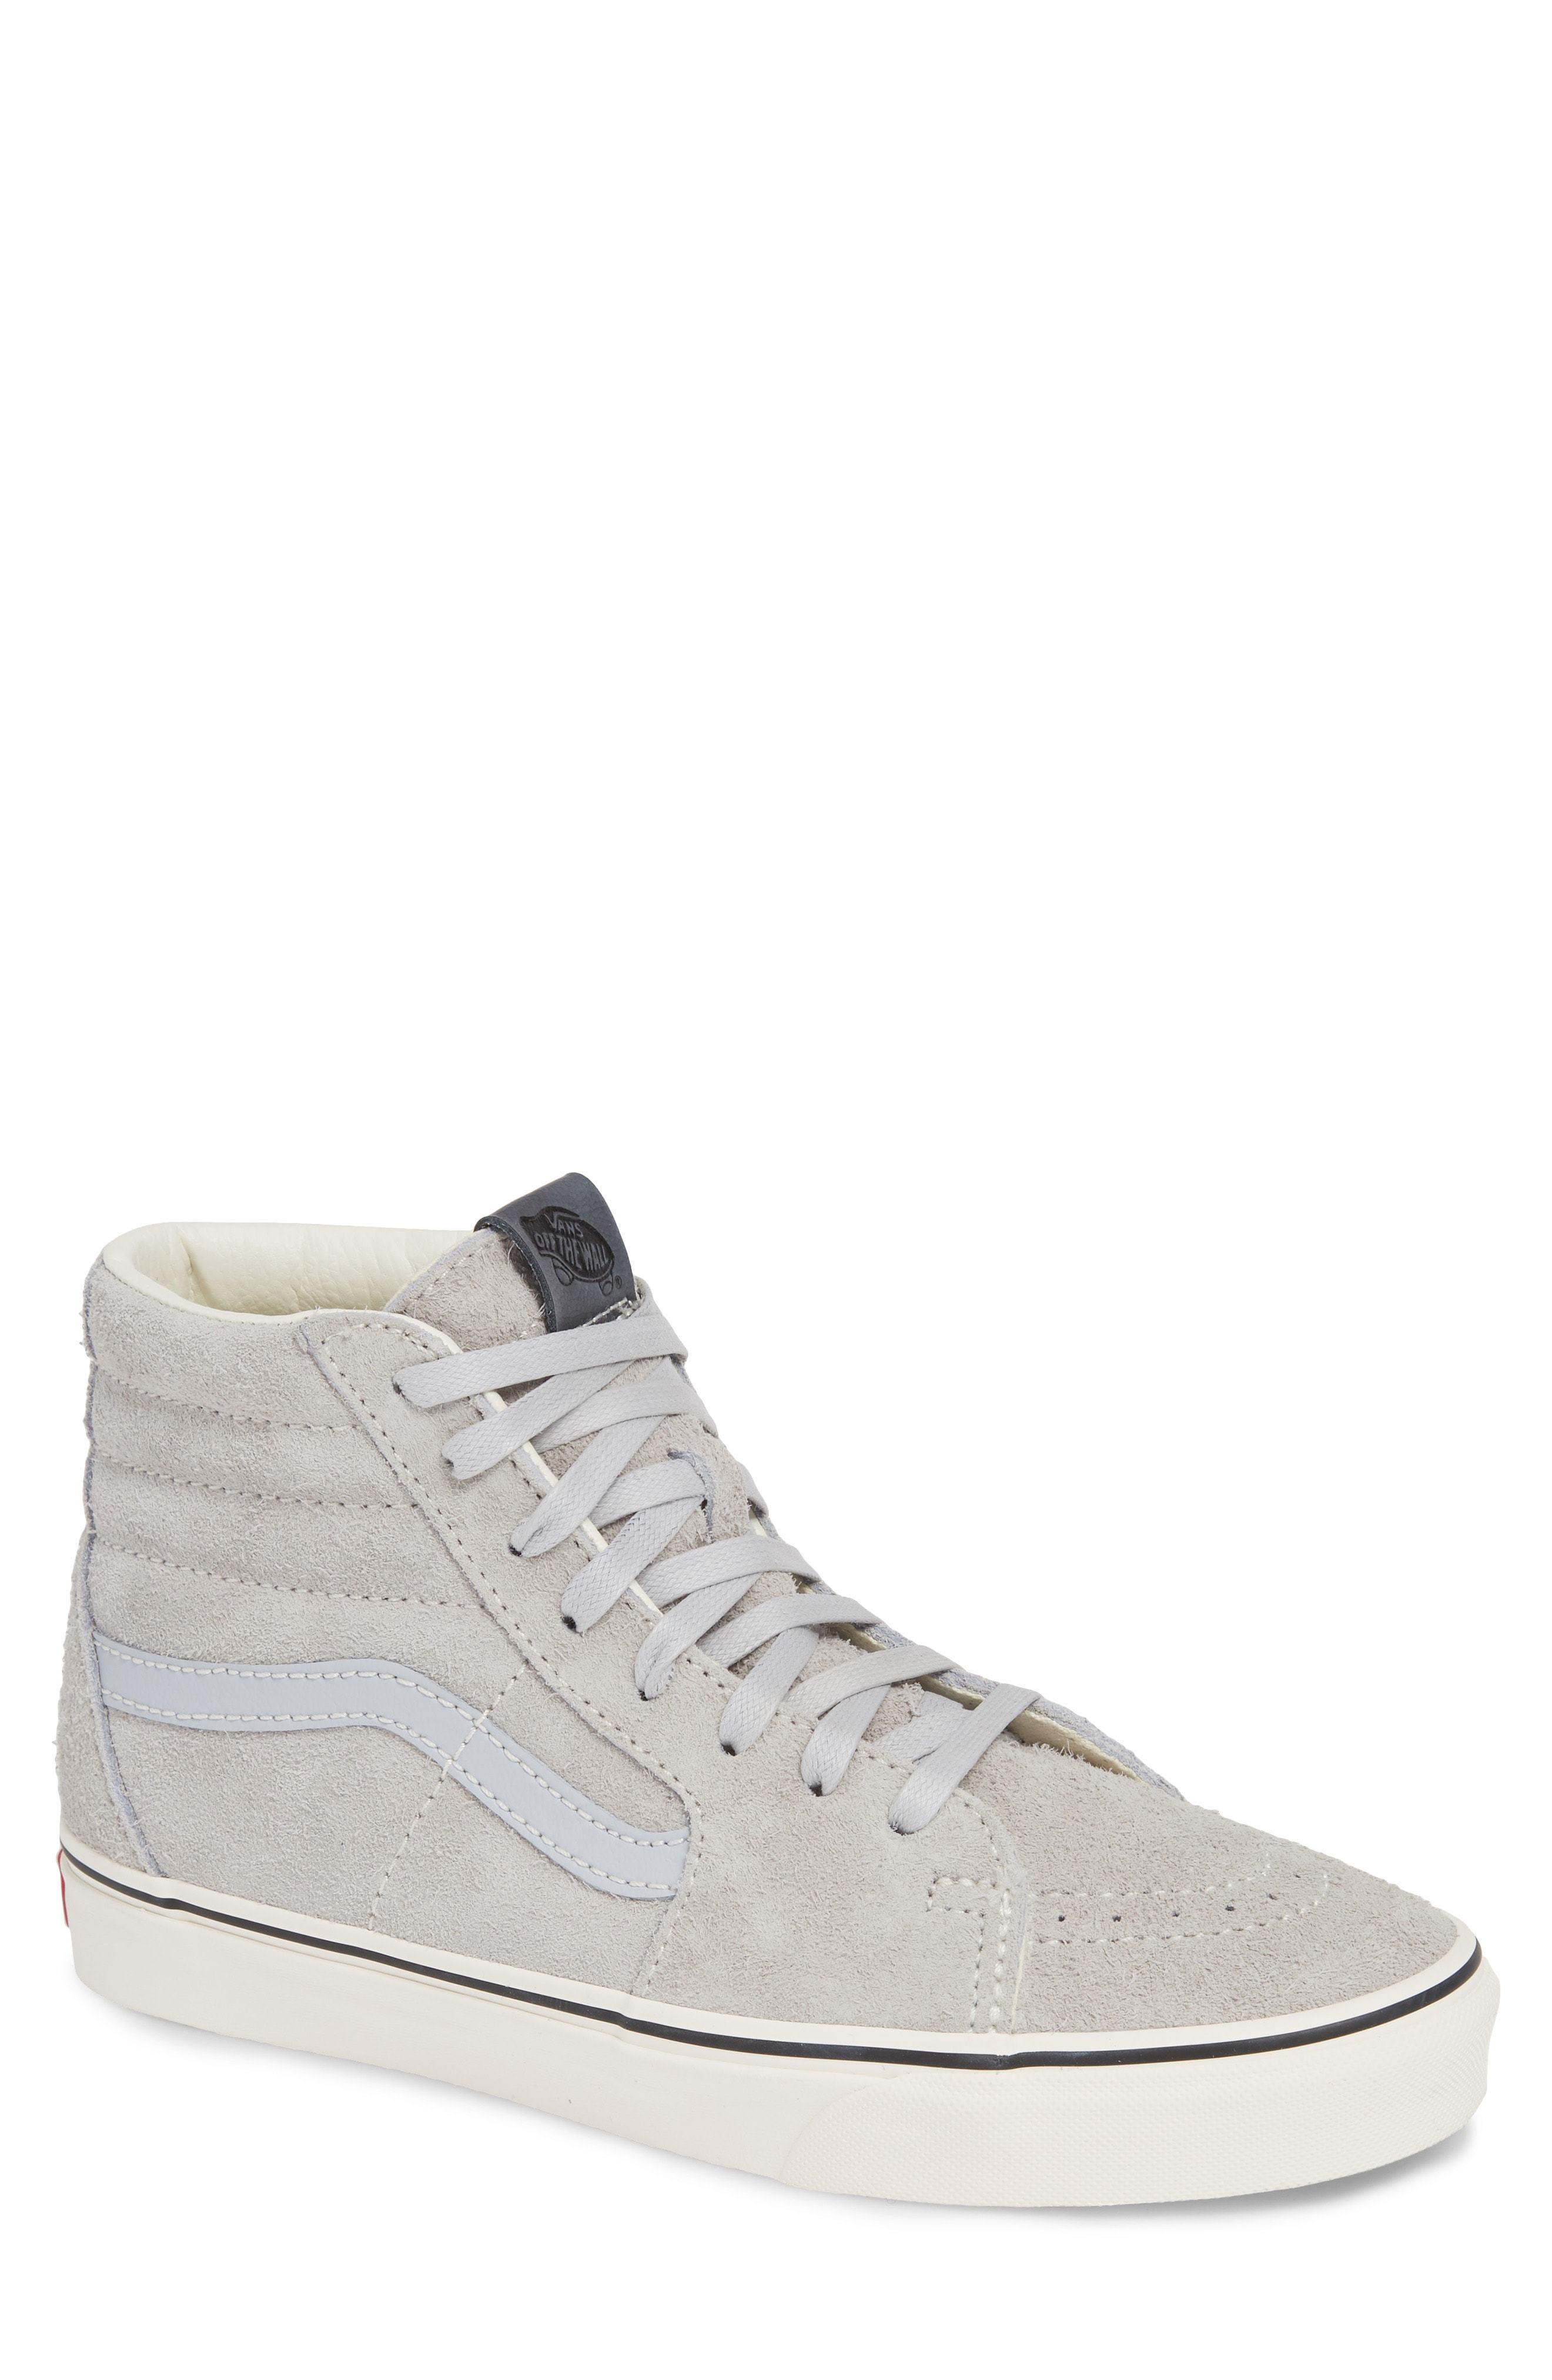 01104771e9 ... Vans Sk8 Hi Hairy Suede Sneaker